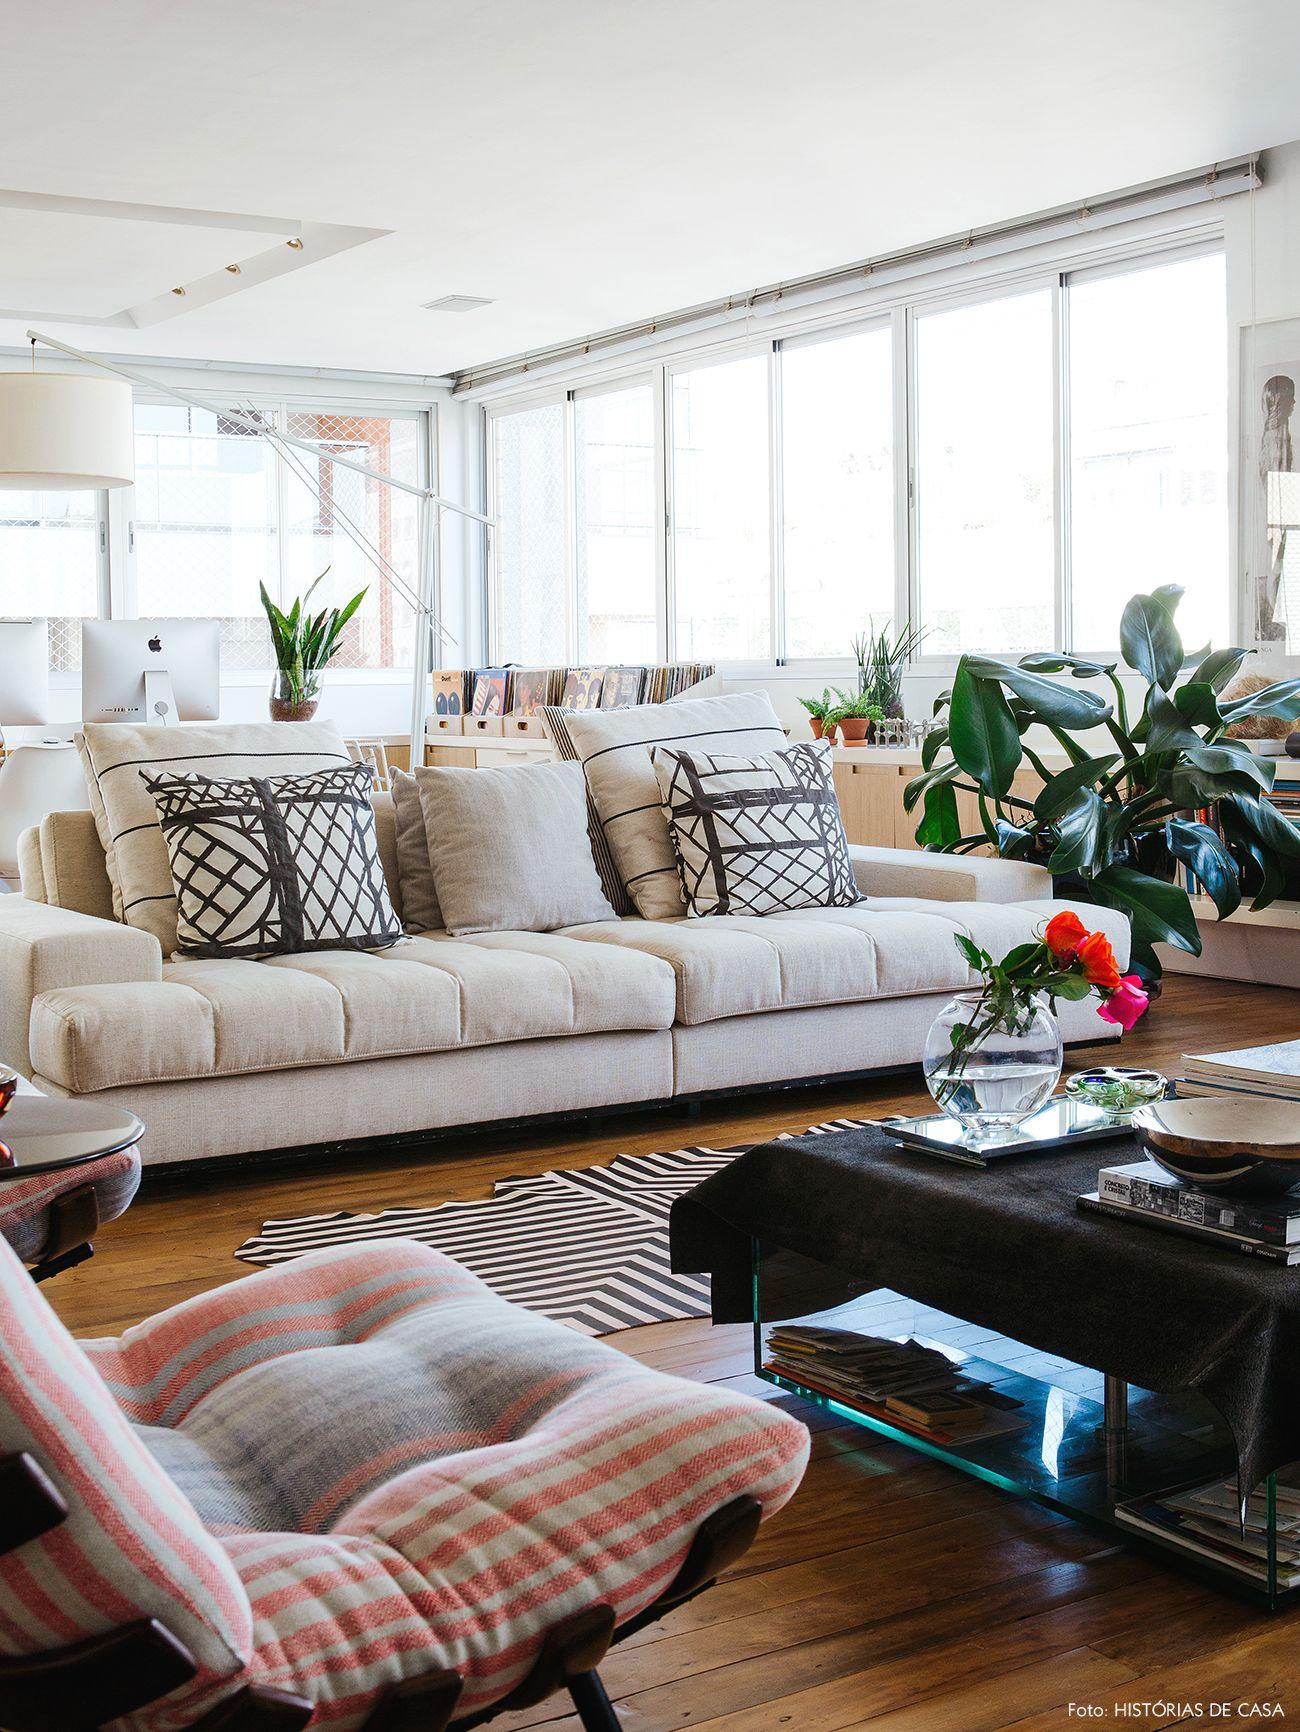 Beautiful Sofá Bege Com Almofadas Geométricas E Ao Fundo Home Office. My House, Home  Office